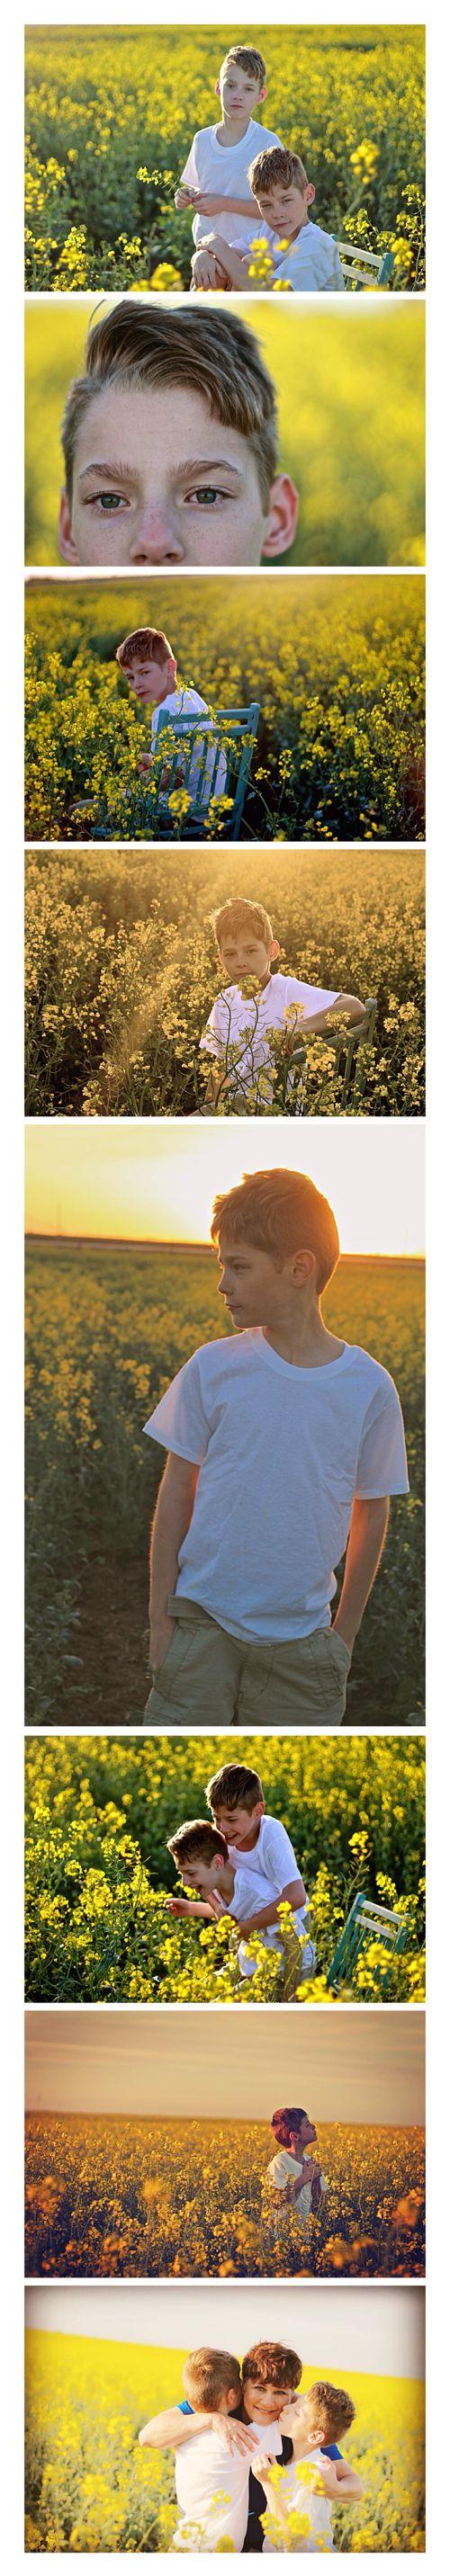 Canola field/ sunset shoot.